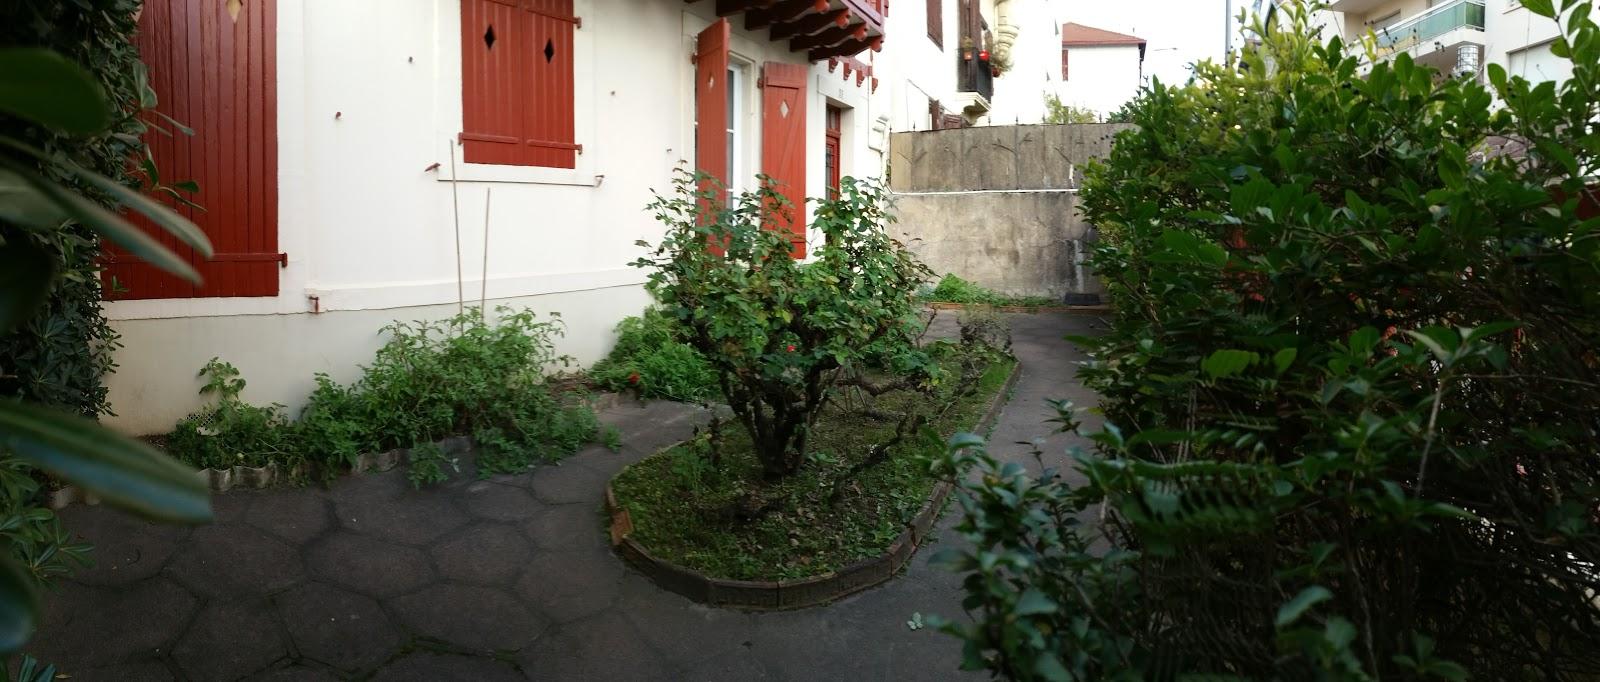 permaculture design en france biarritz